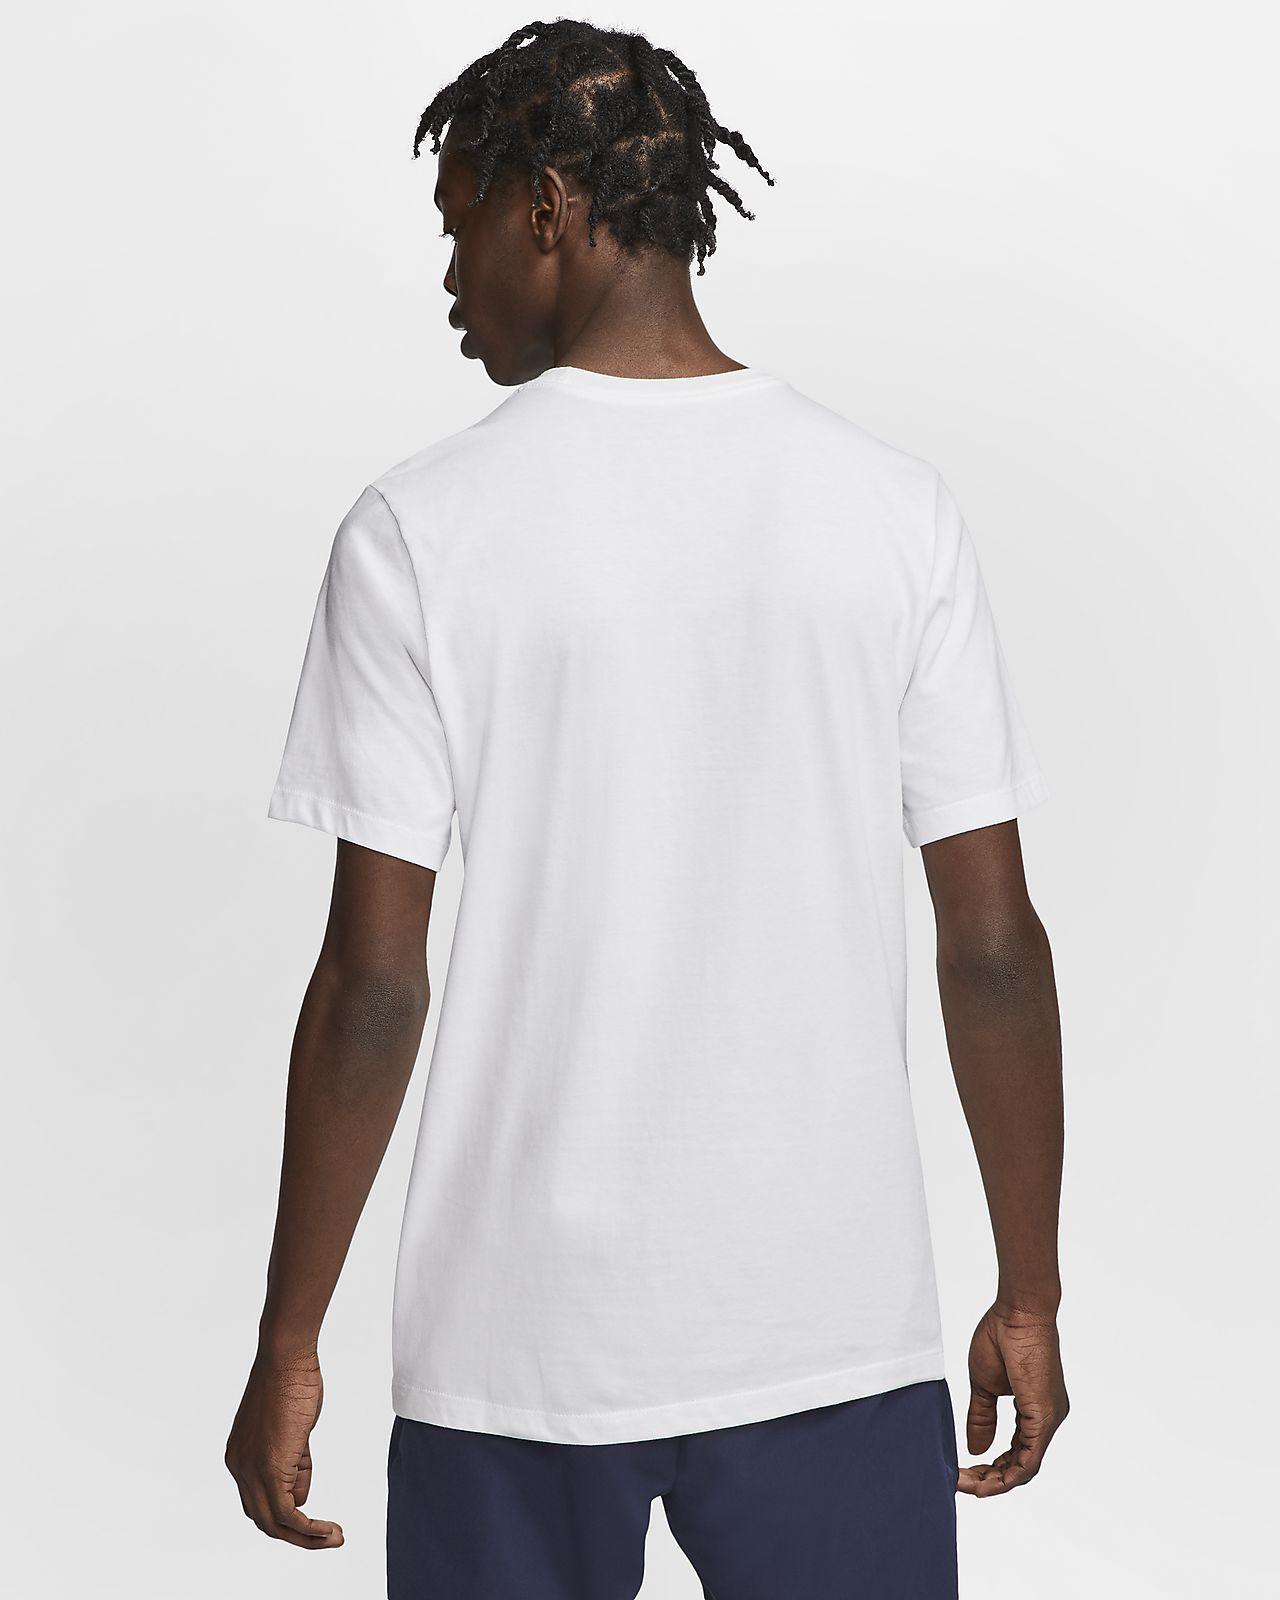 NikeCourt tennis T shirt til mænd